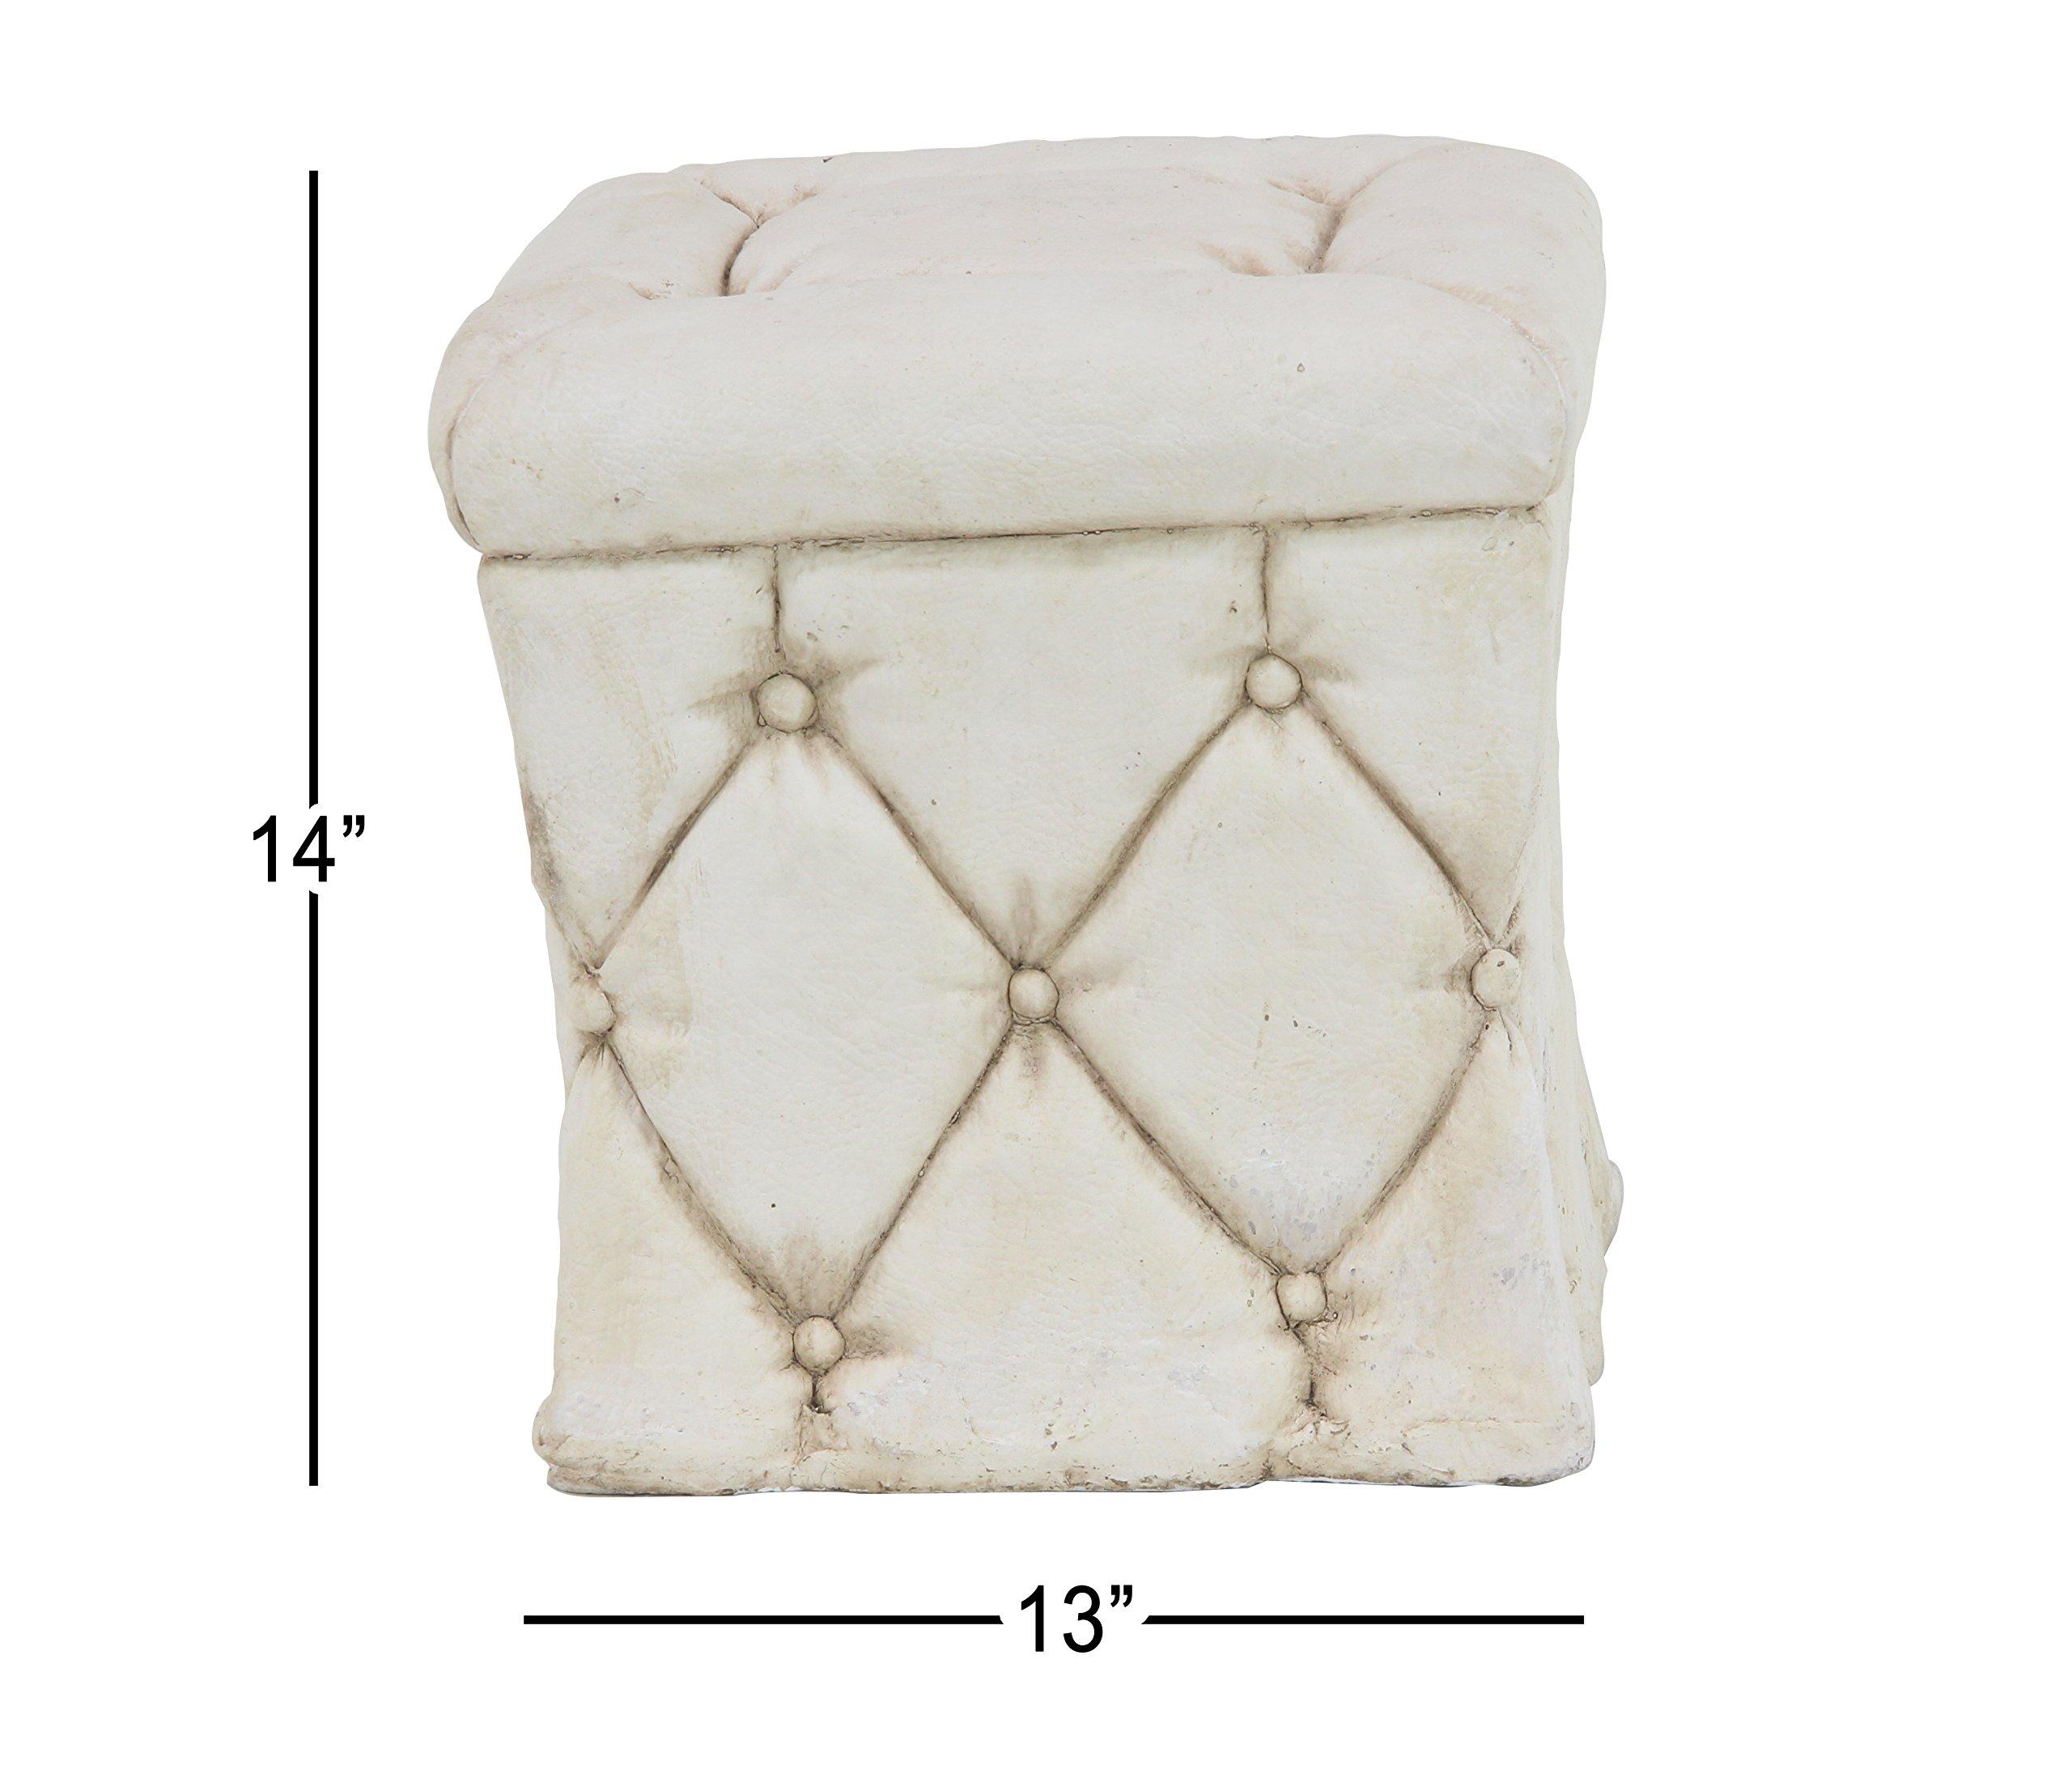 Deco 79 36839 Garden Pedestal, White by Deco 79 (Image #3)